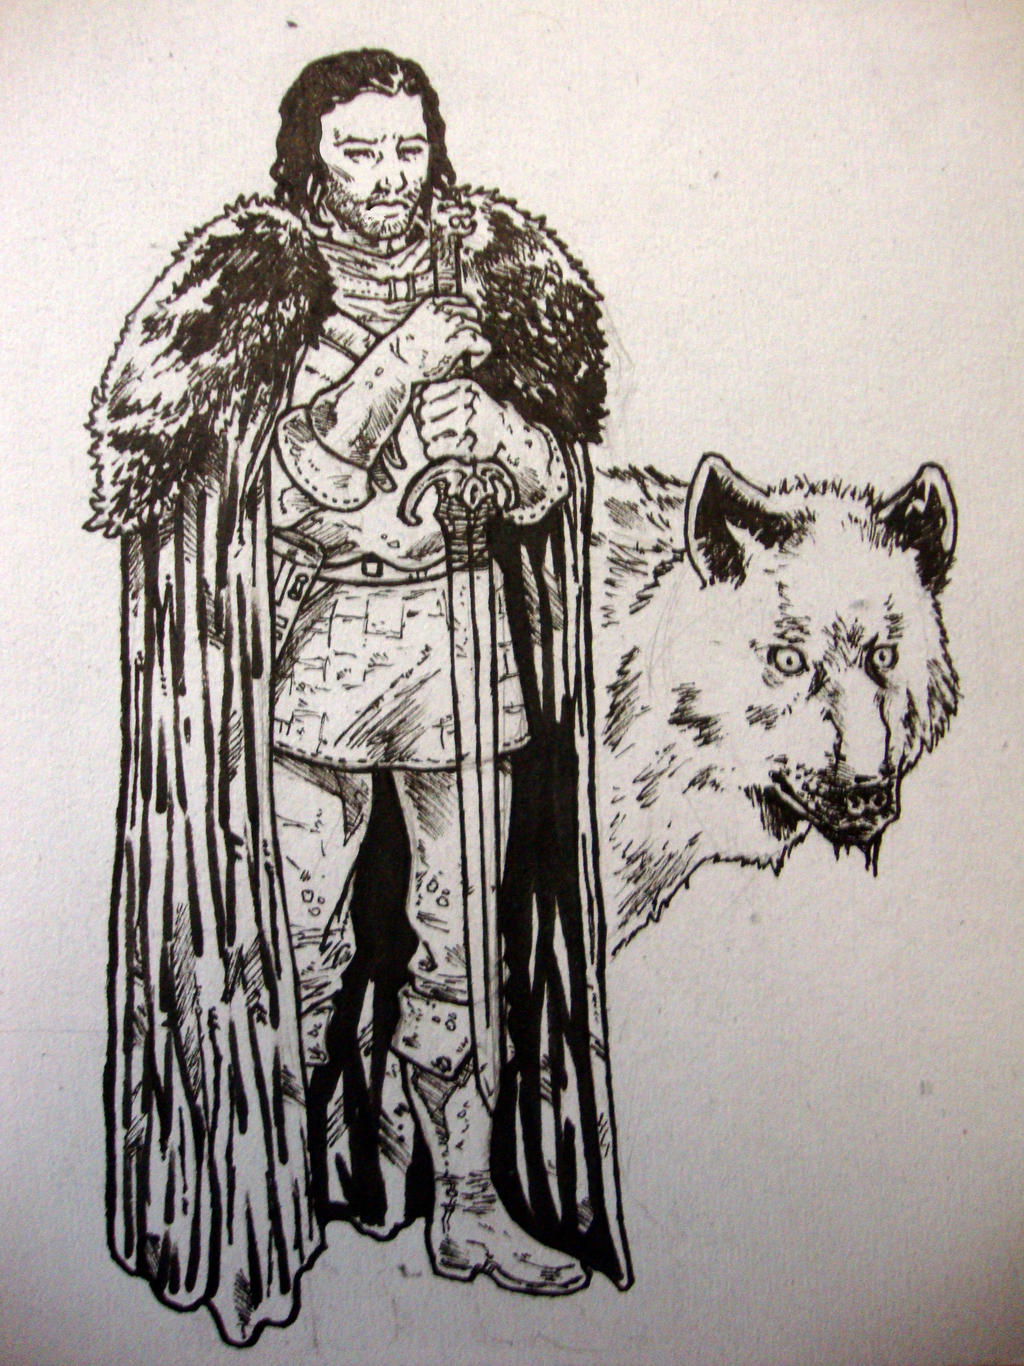 Jon Snow2 by IgorChakal